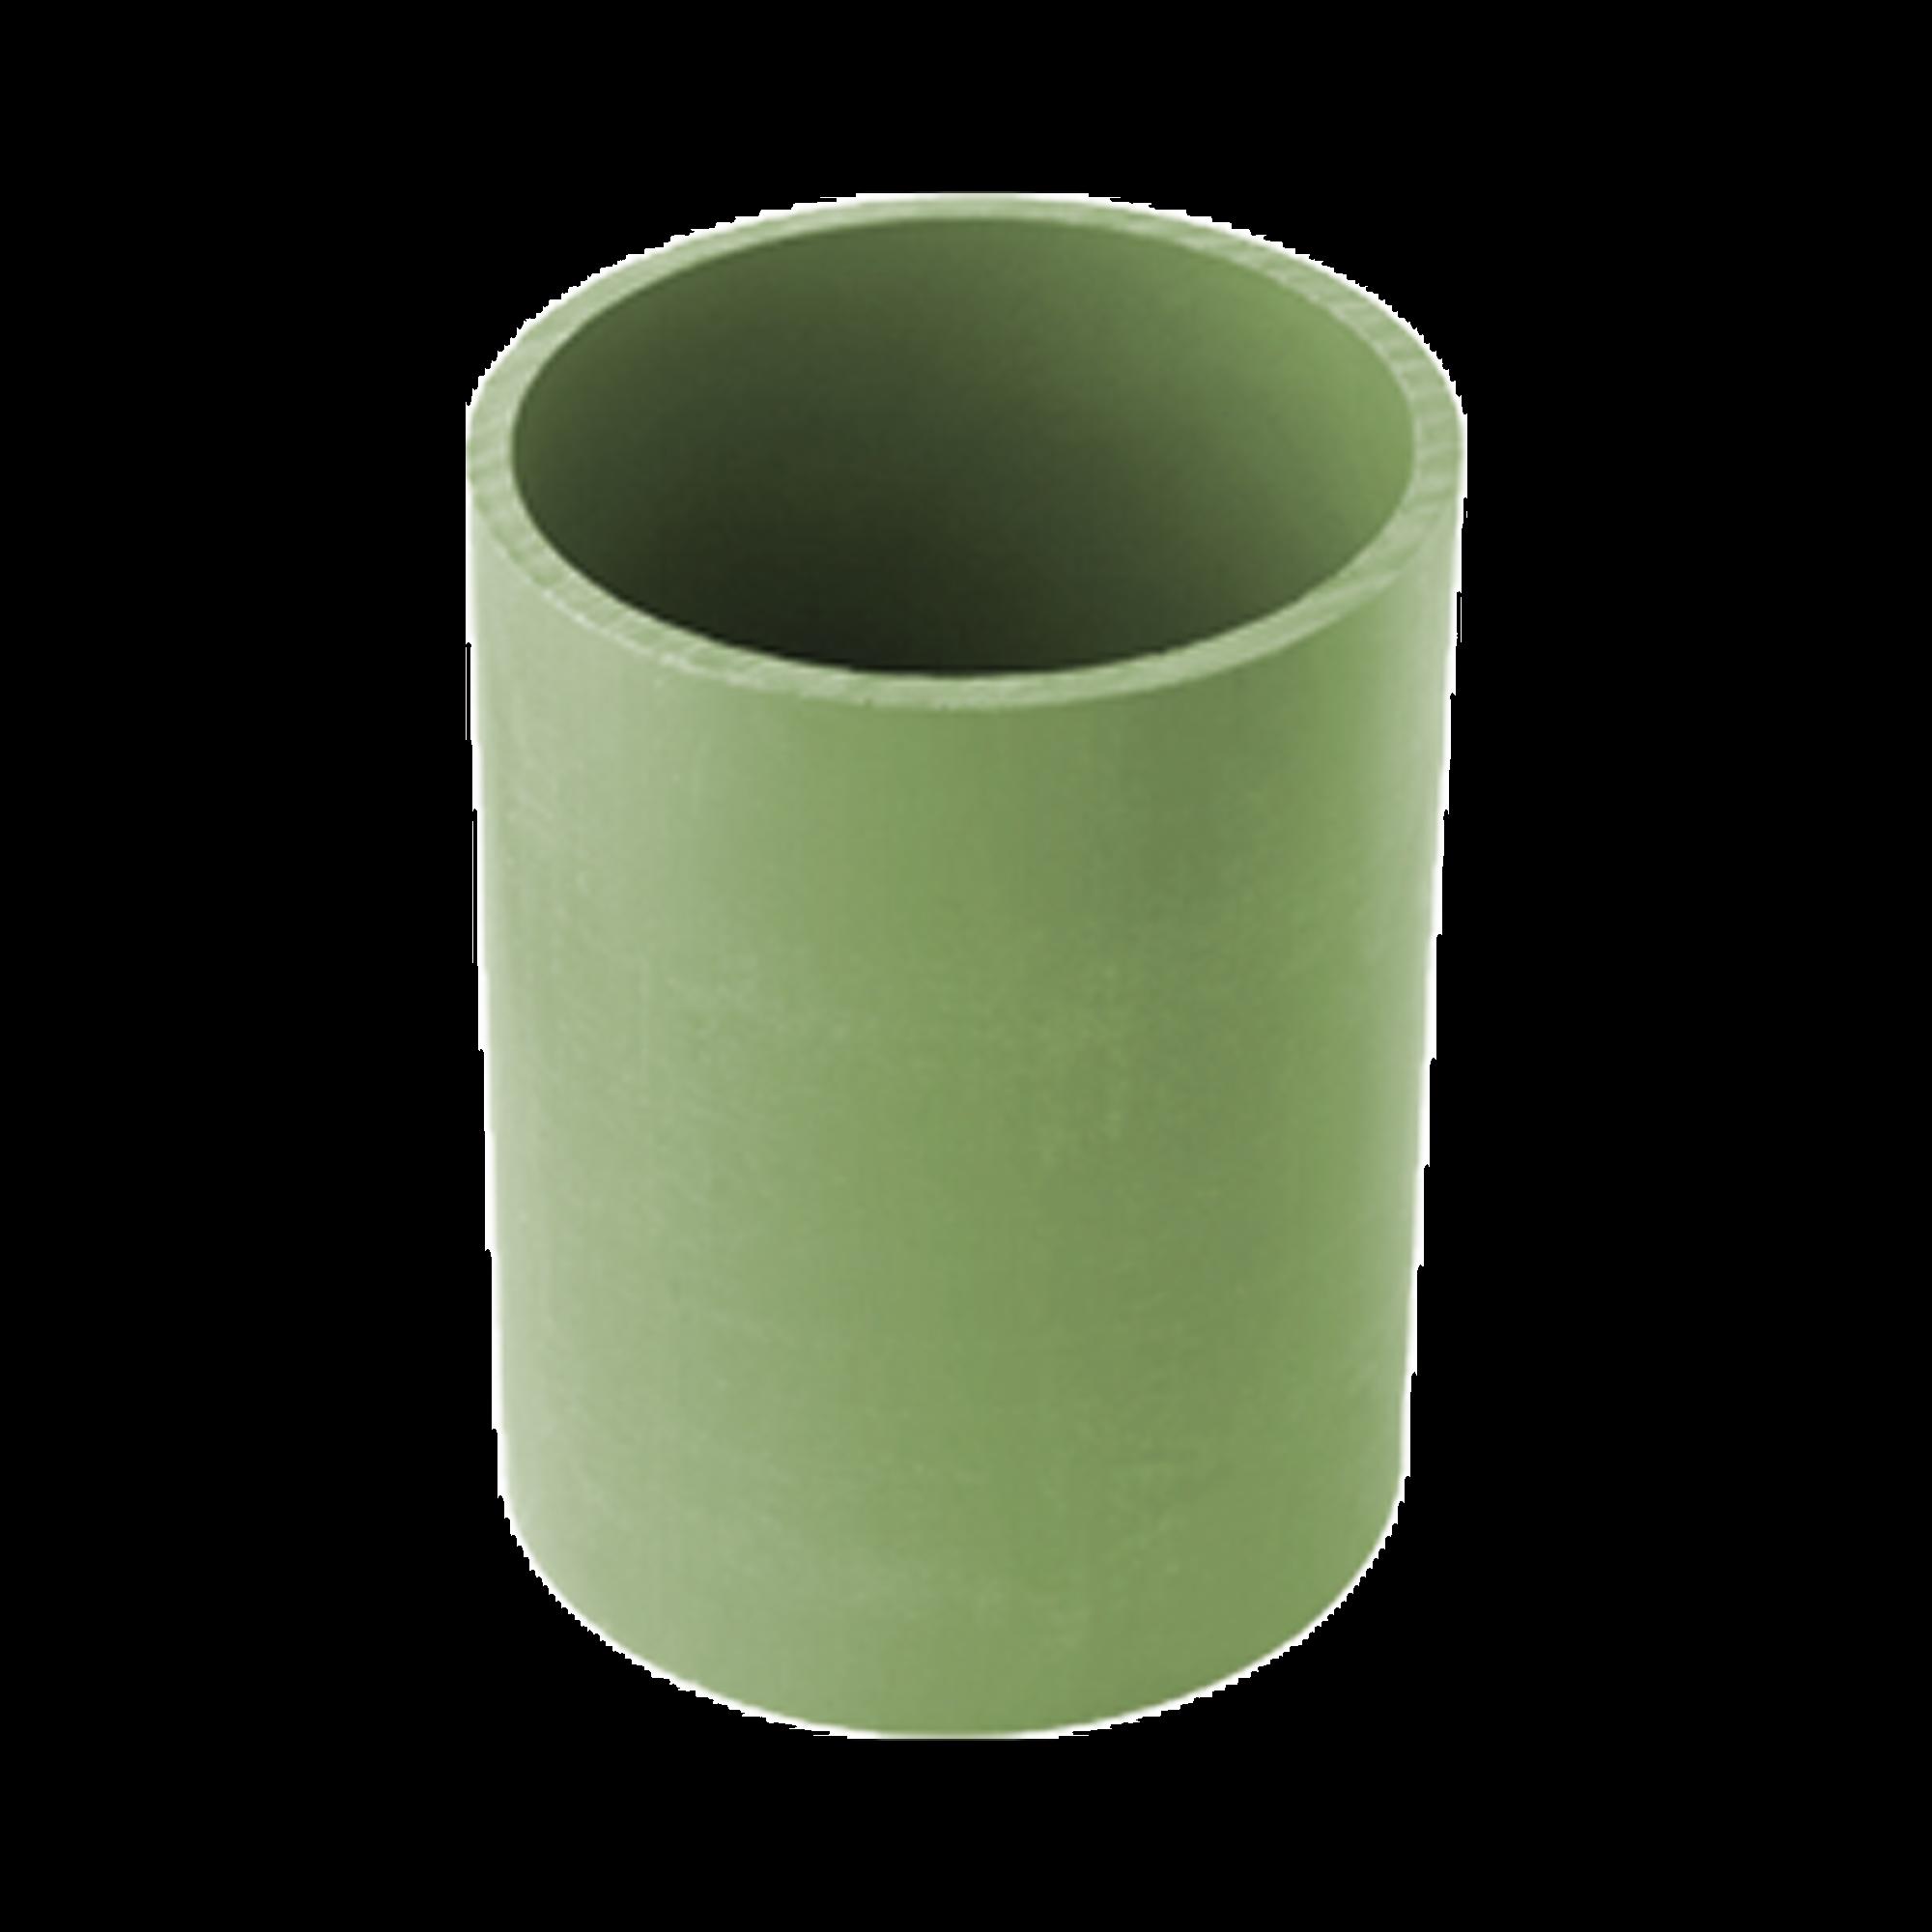 Cople para tubo PVC Conduit  pesado de 1 (25mm)